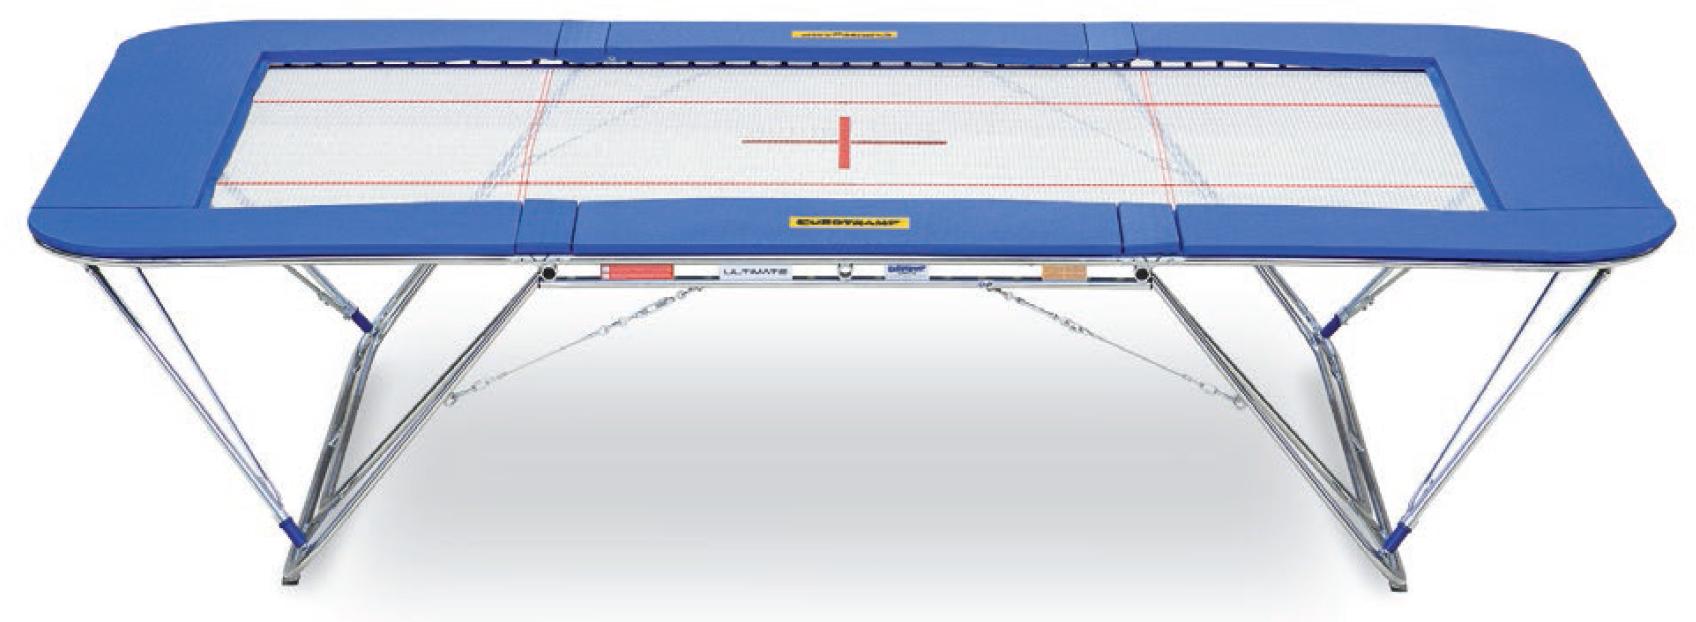 eurotramp 7x14 competition trampoline. Black Bedroom Furniture Sets. Home Design Ideas